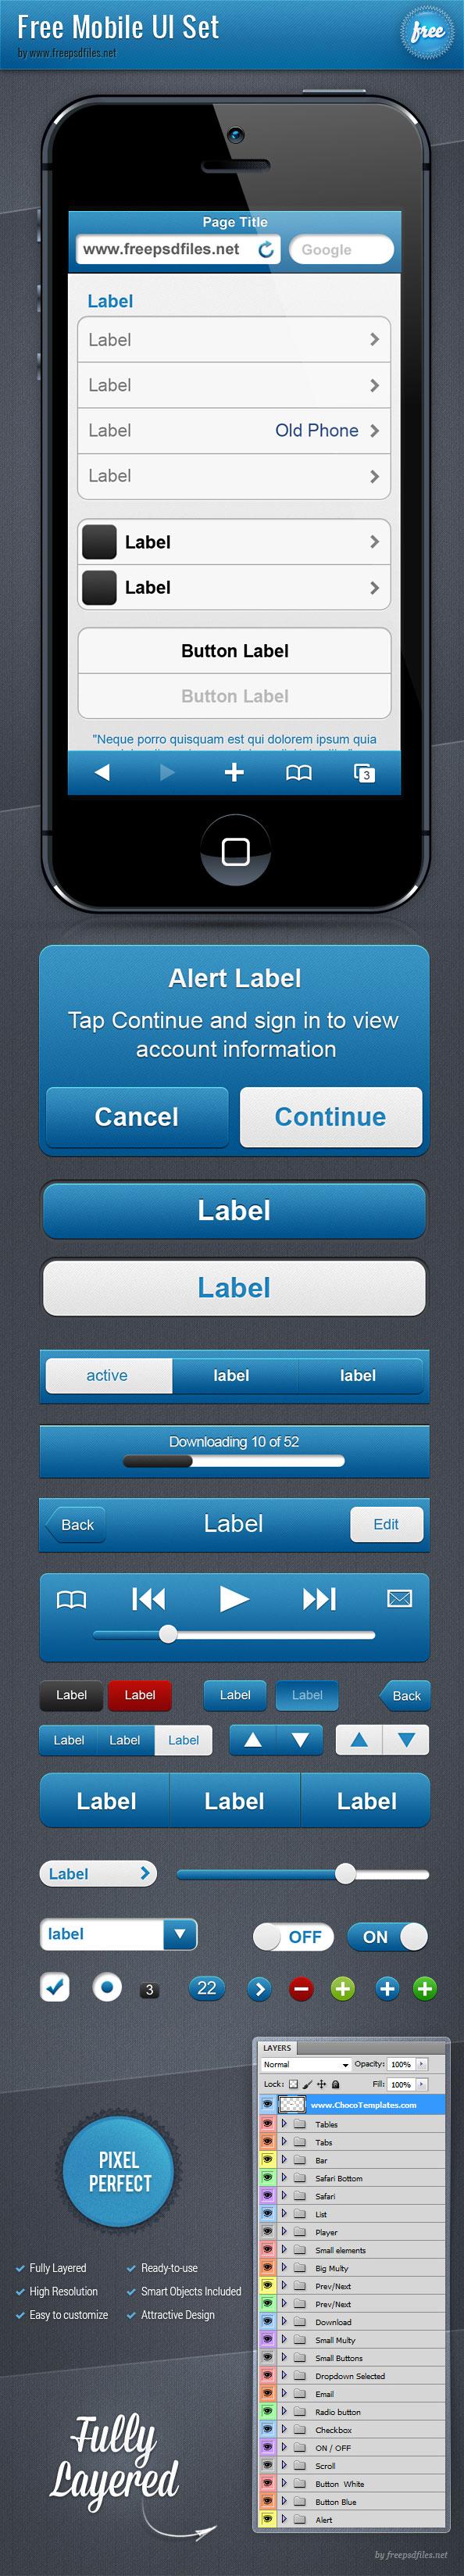 Mobile UI Free PSD Set - Free PSD Files